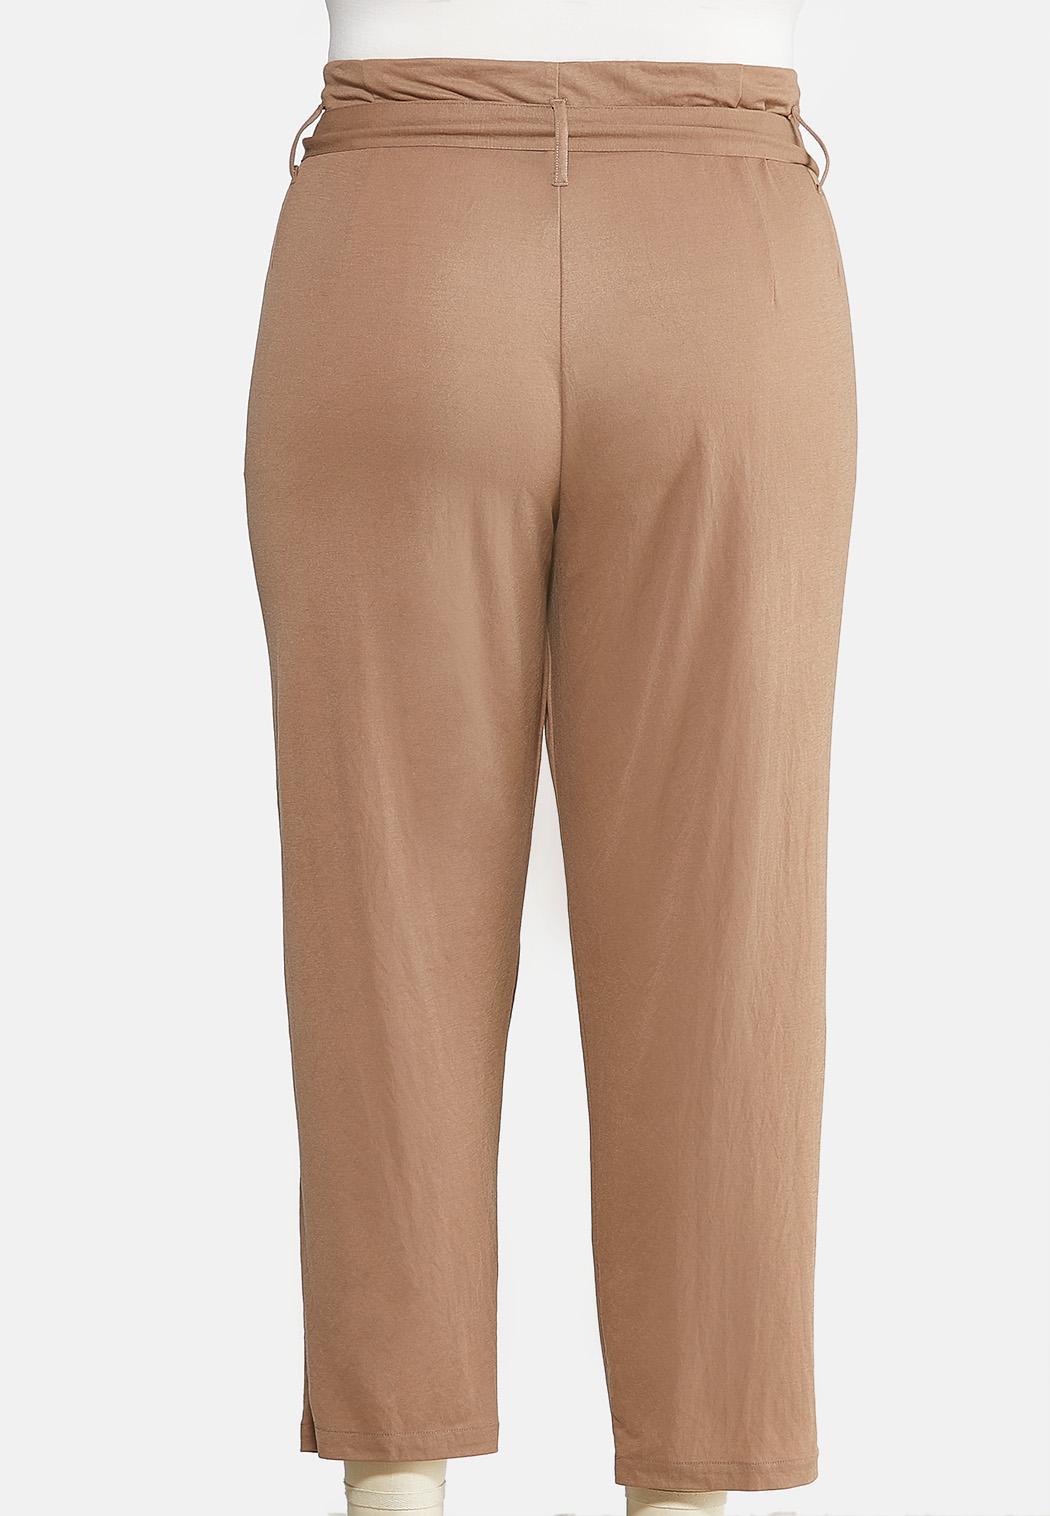 Plus Size Tie Waist Paperbag Pants (Item #43960479)